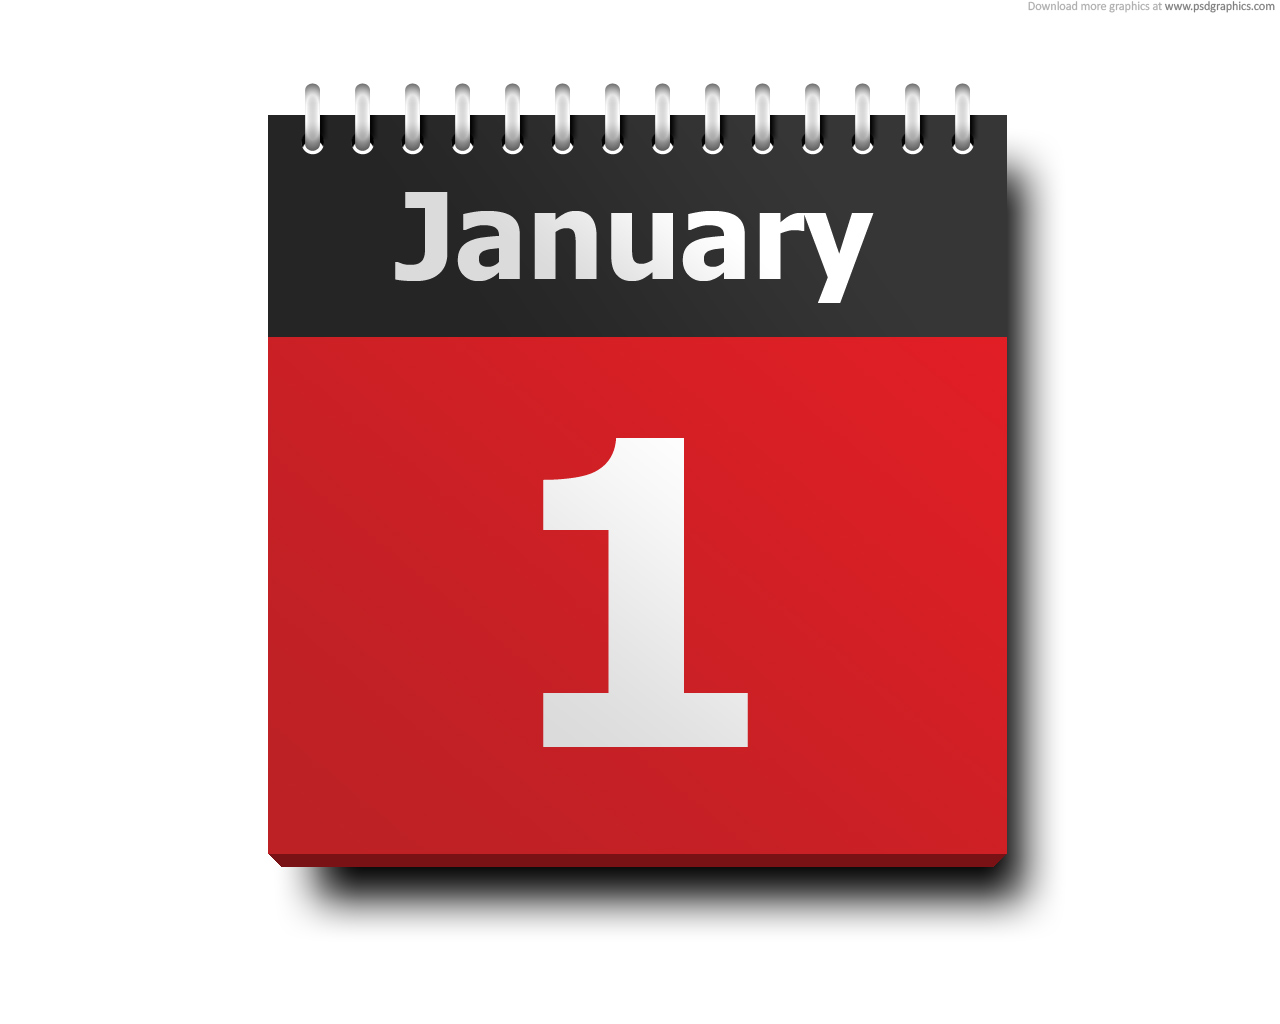 Calendar Graphic Icon : January calendar icon psdgraphics